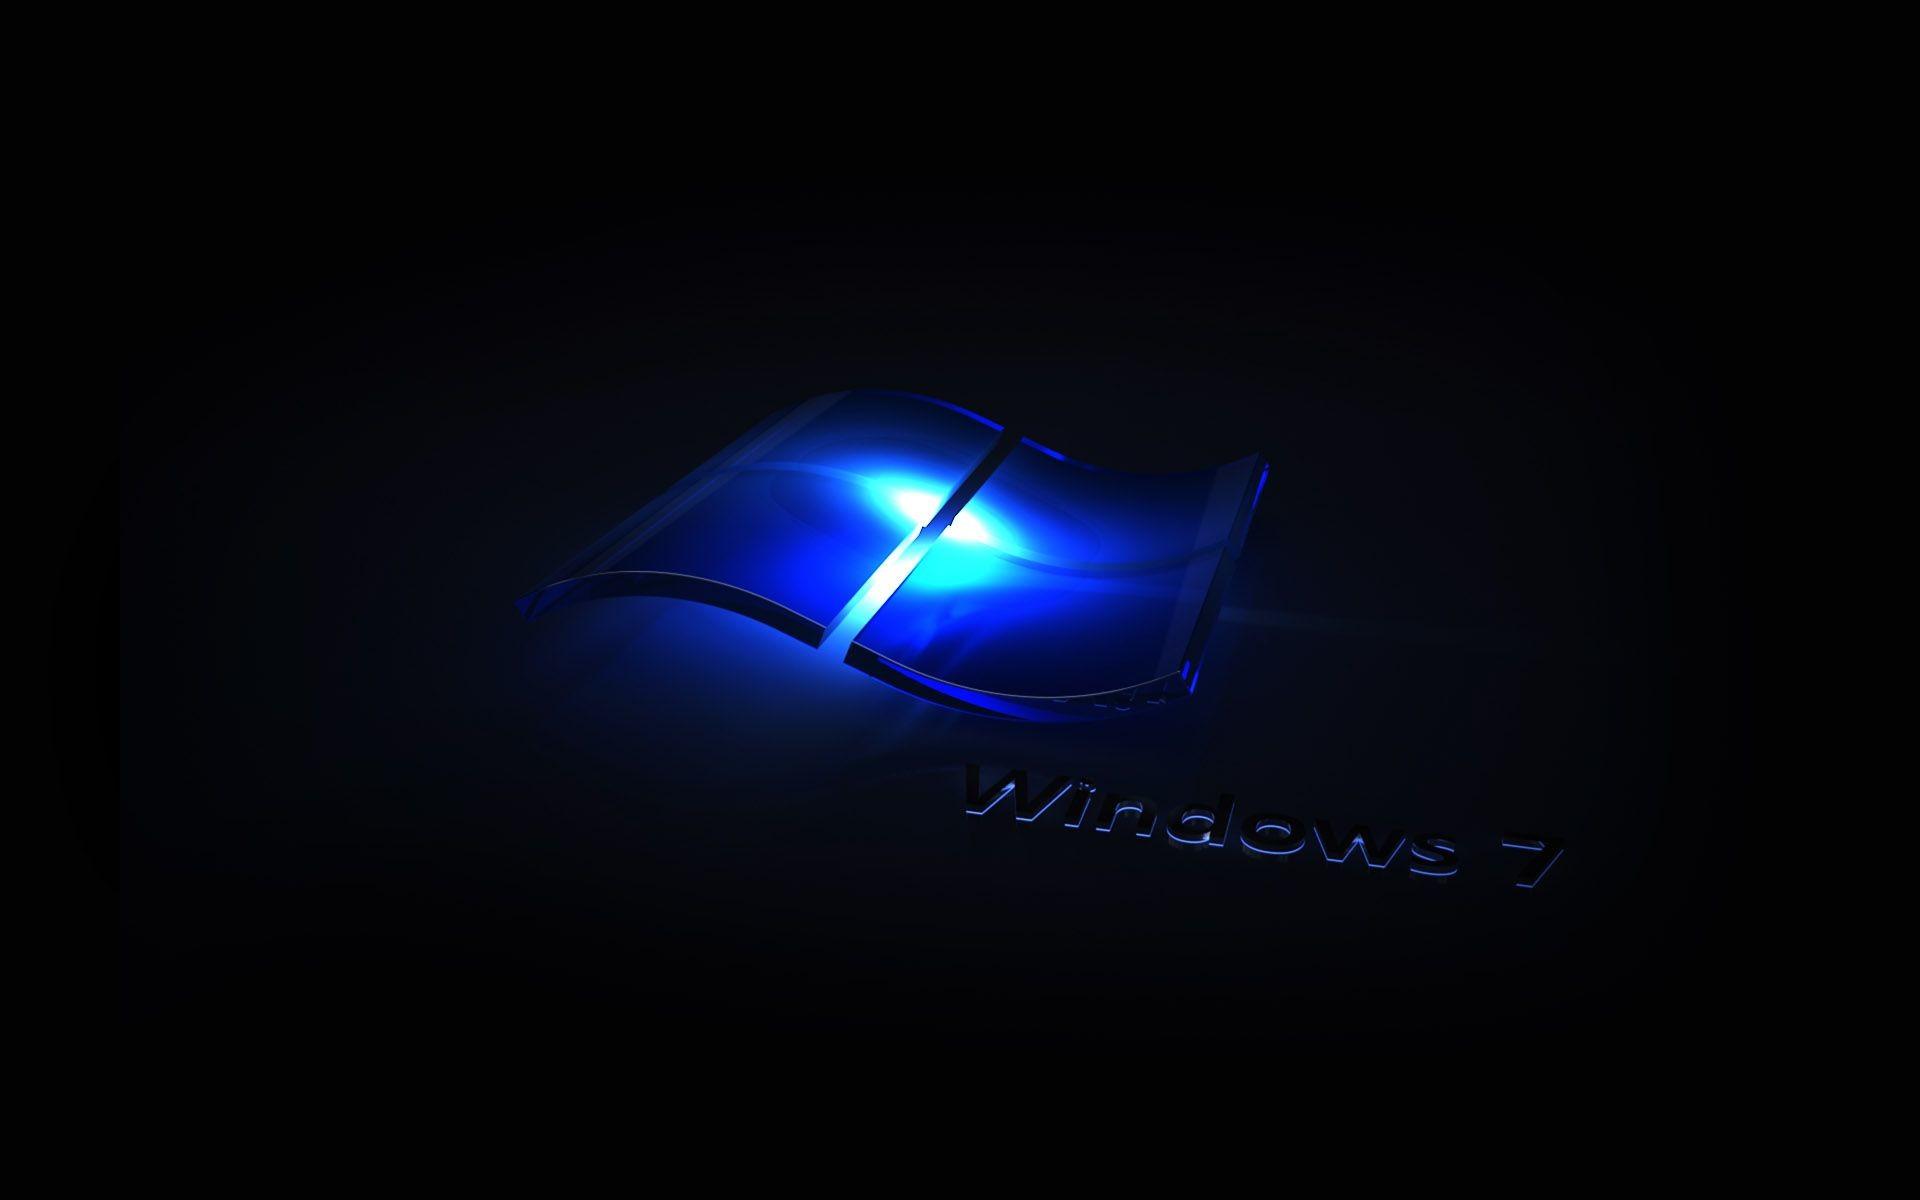 Windows 7 Dark Black Blue Wallpapers – – 126628